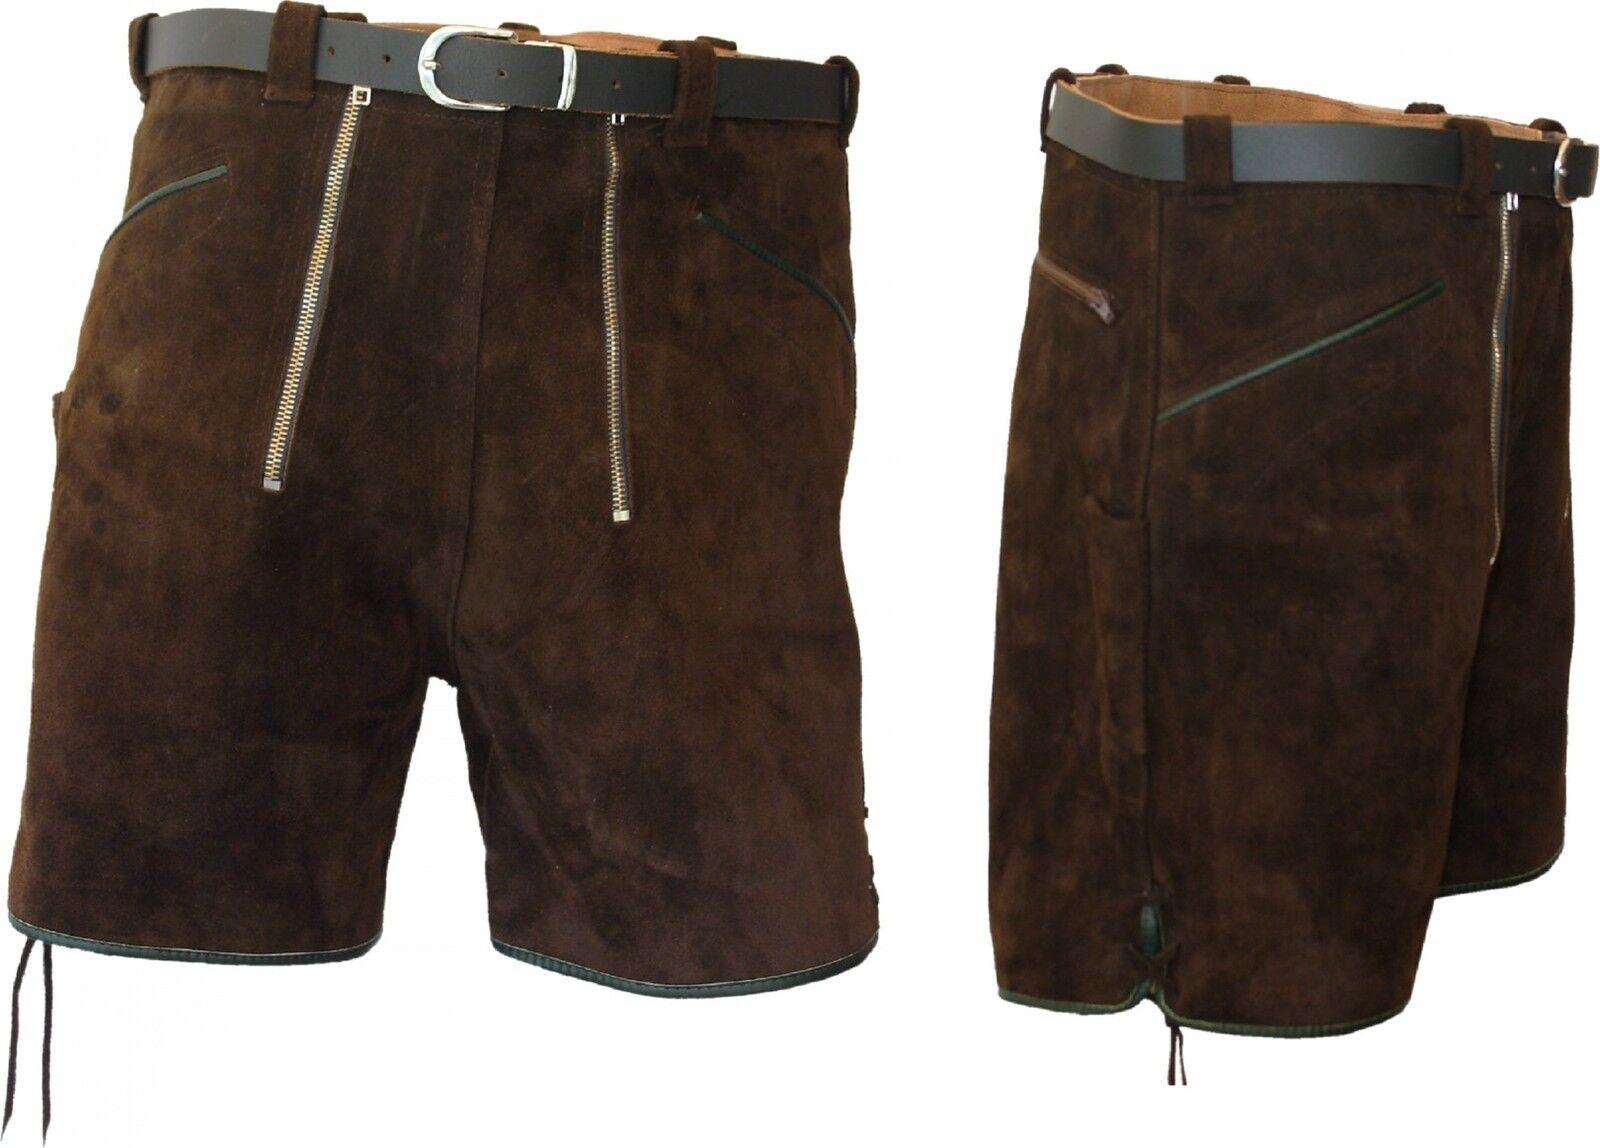 Paese Casa Moda breve Lederhose 2 cerniere con cintura shorts in pelle Marroneee